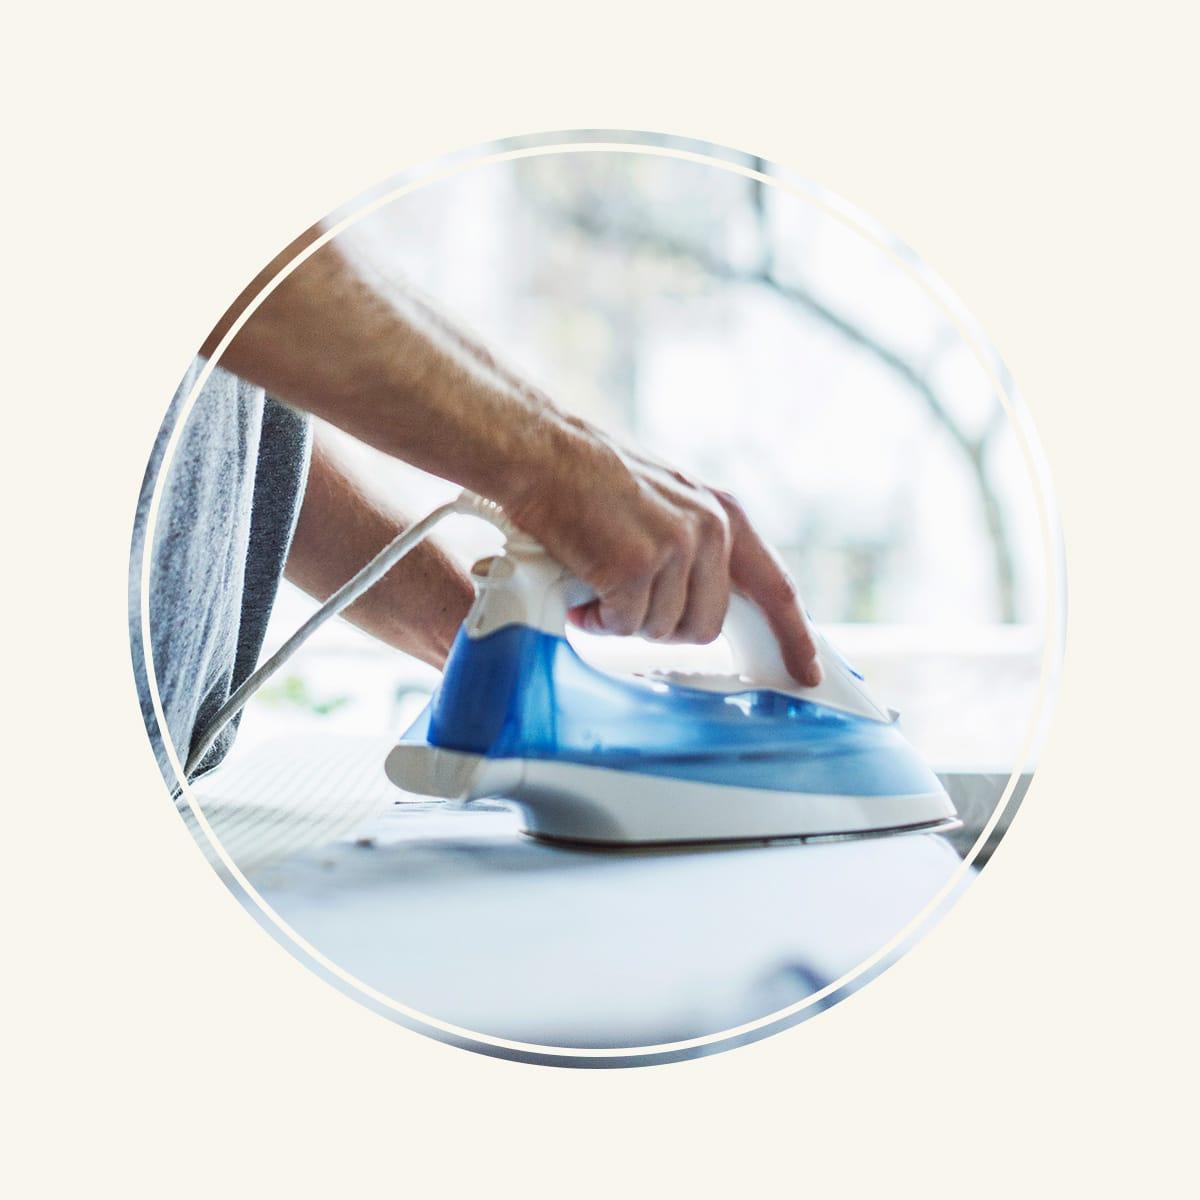 ironing a dress shirt